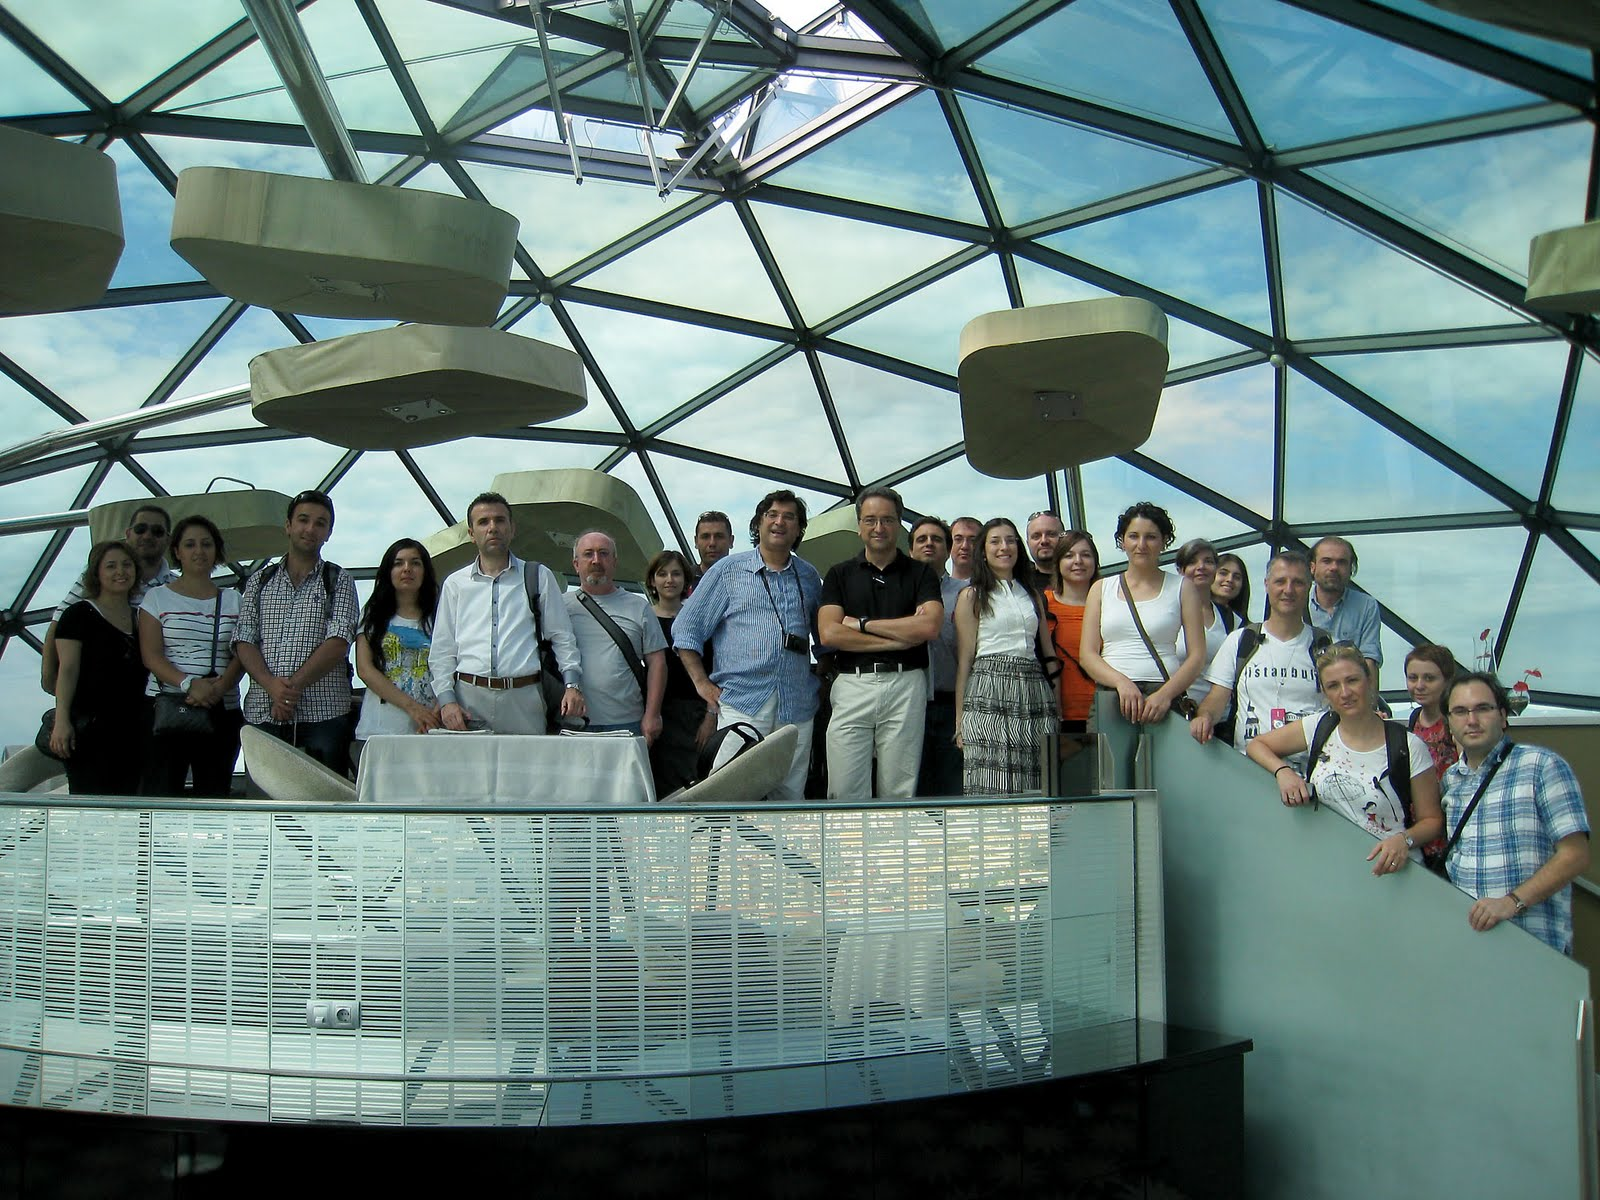 Reynaers aluminio y arquitectura julio 2011 - Despacho arquitectura barcelona ...